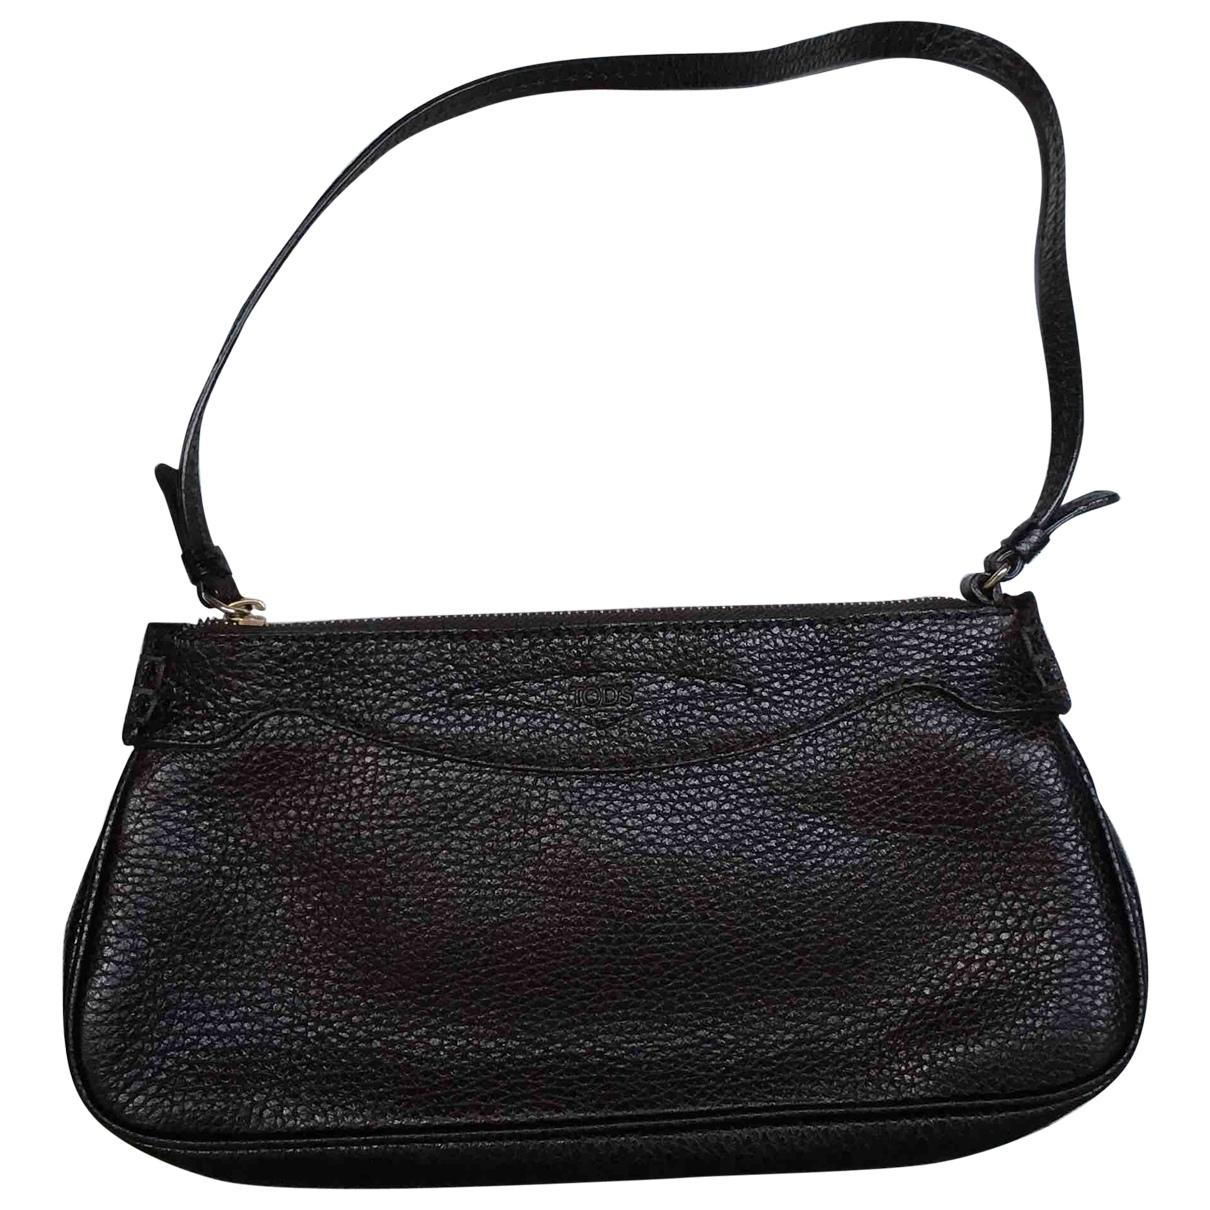 Tod's \N Brown Leather handbag for Women \N